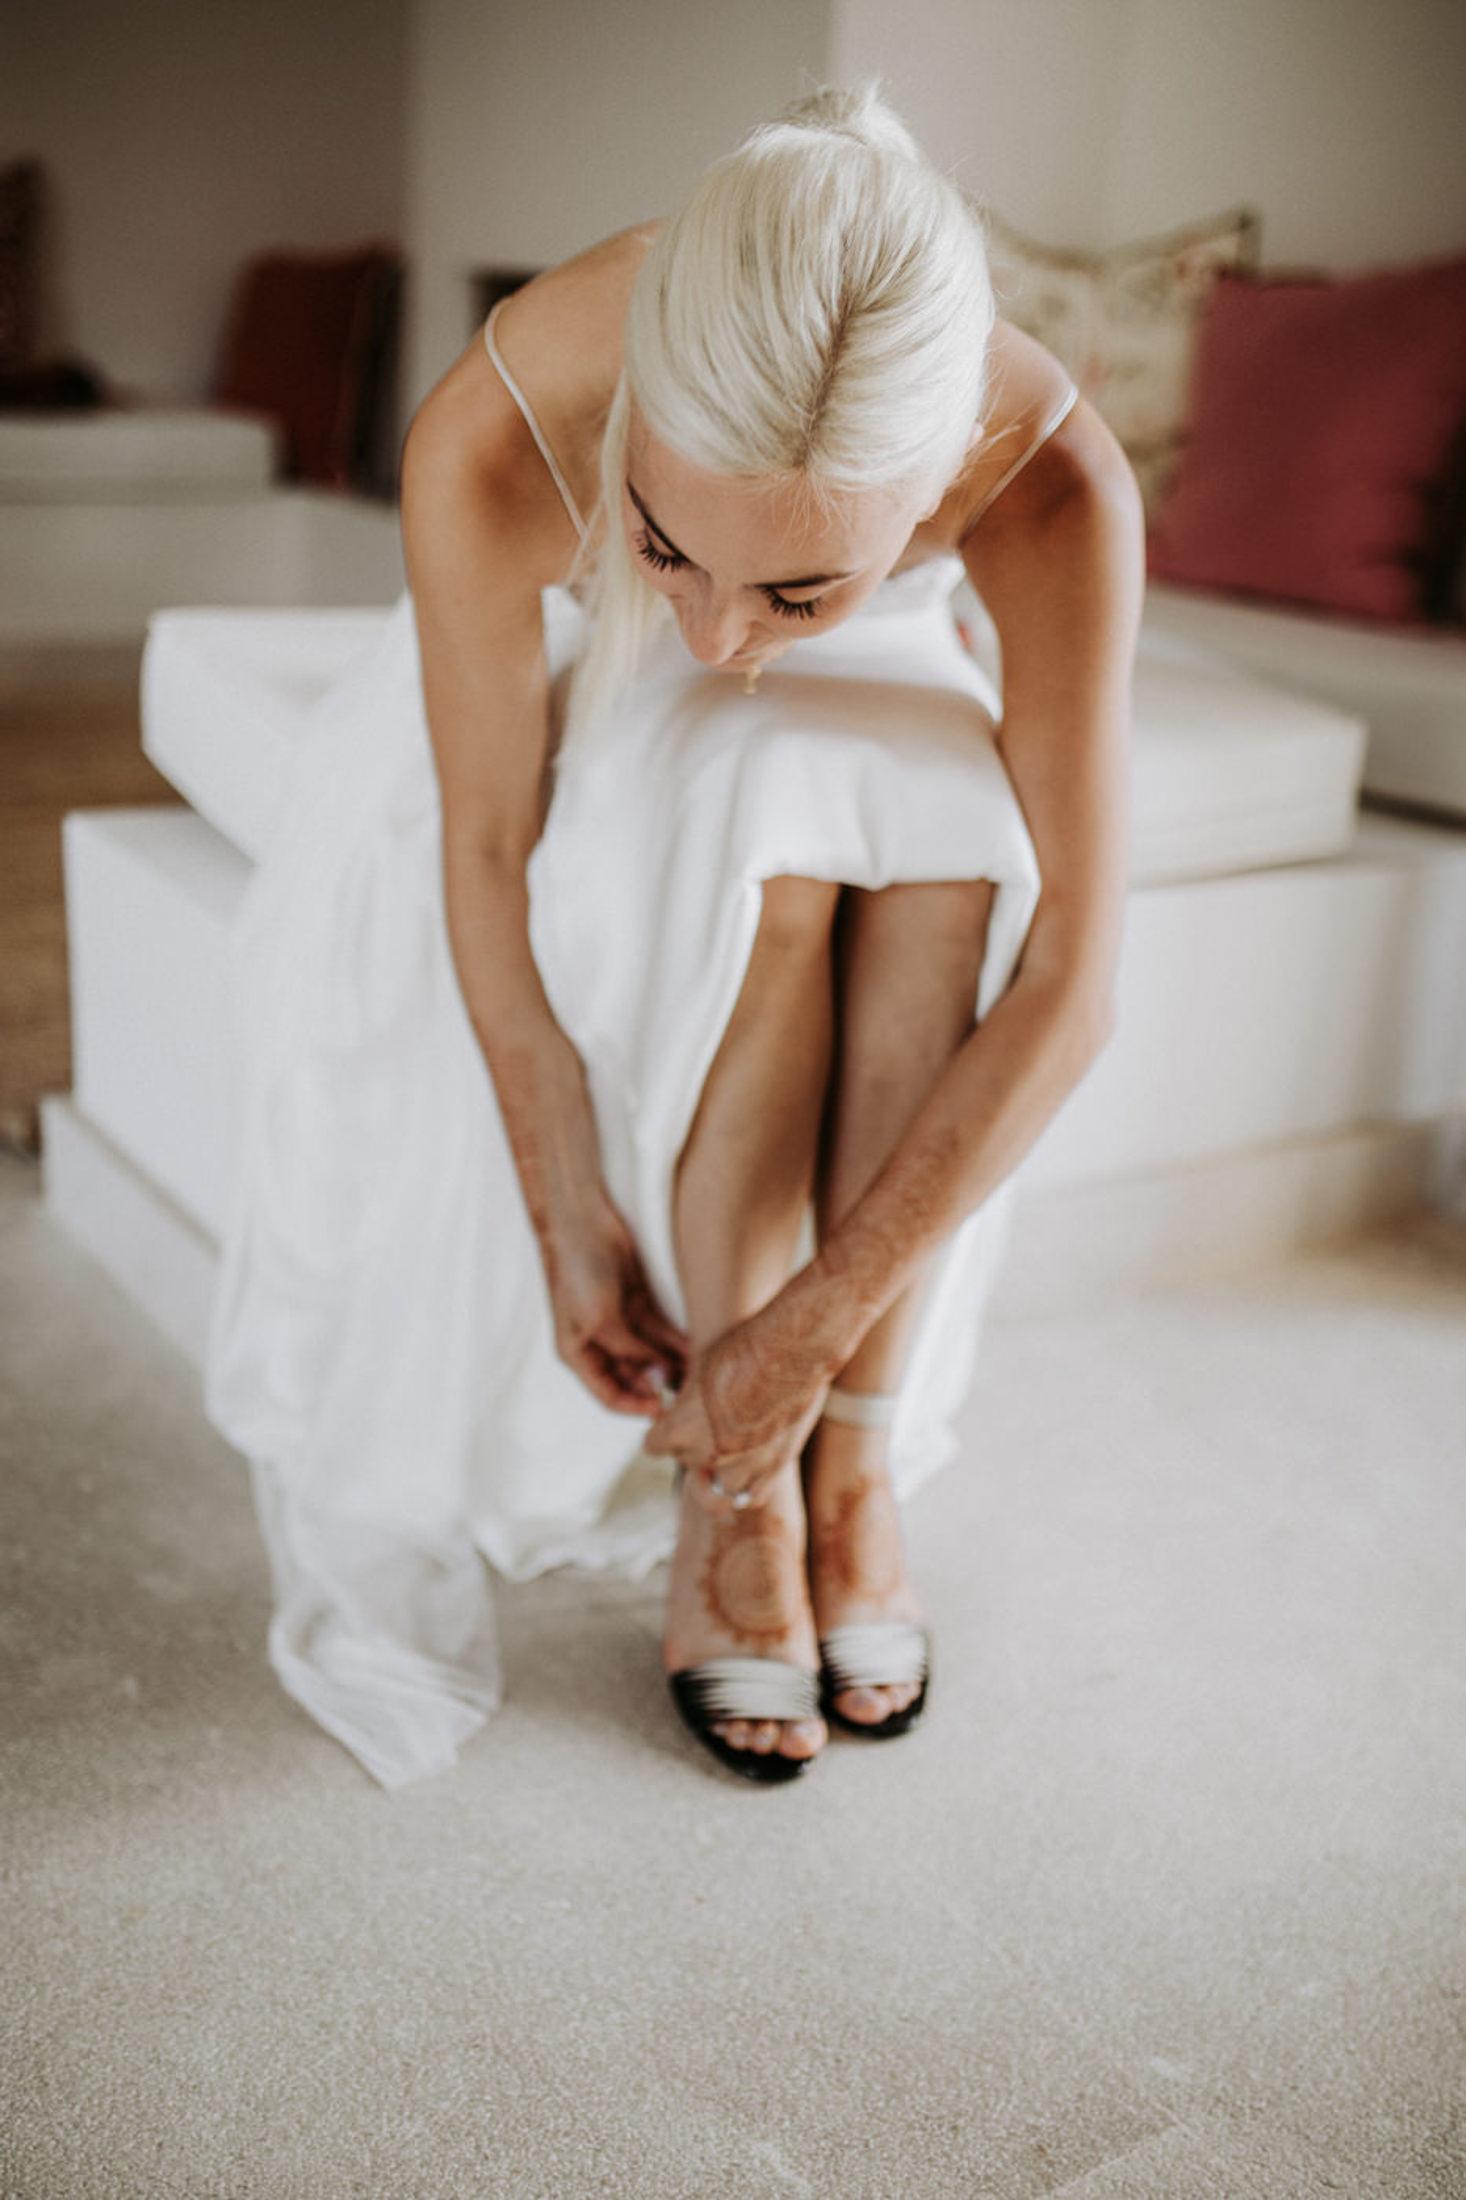 Wedding_Photographer_Mallorca_Daniela-Marquardt_Photography_New_York_Iceland_Tuscany_Santorini_Portugal_Austria_Bavaria_Elopement_Hochzeitsfotograf_AntjeRajat2_74